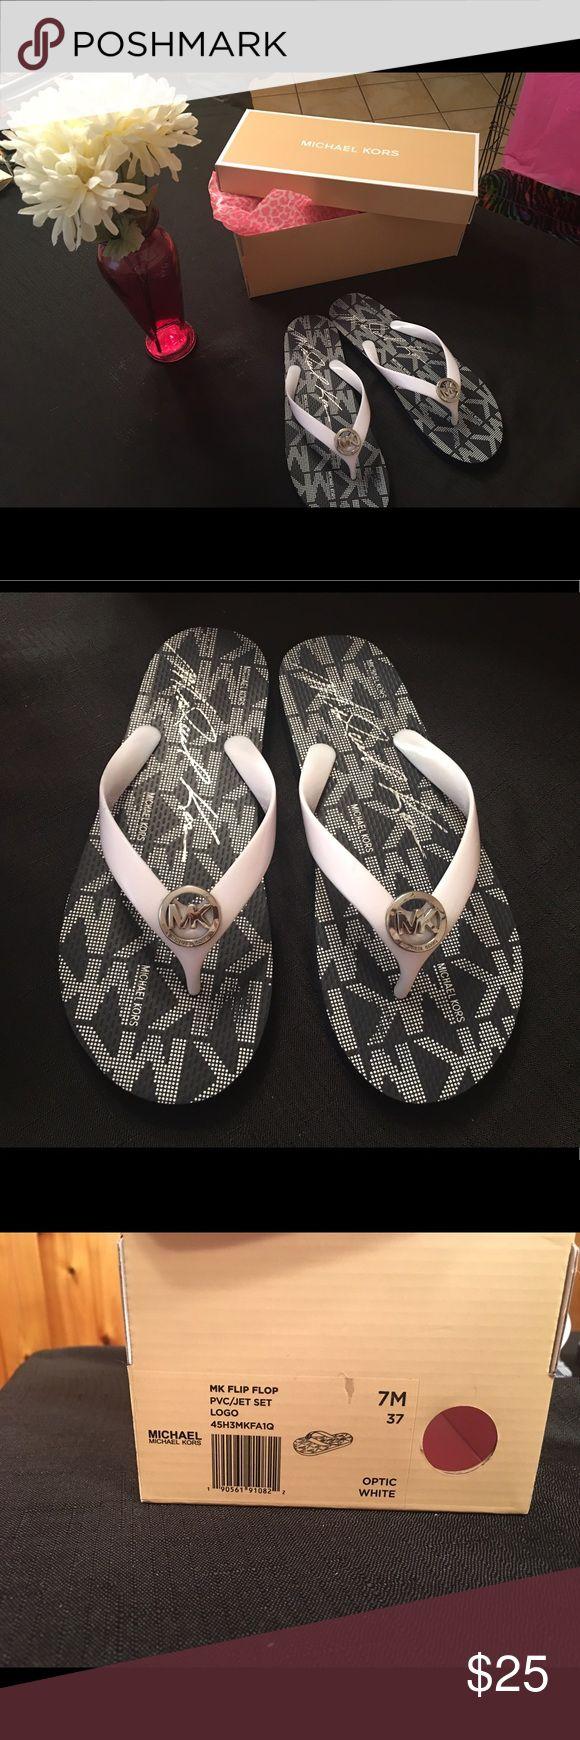 Michael kit flip flops size 7m Super cute navy blue and white flip flops , gently used, 7m .. Michael Kors Shoes Sandals